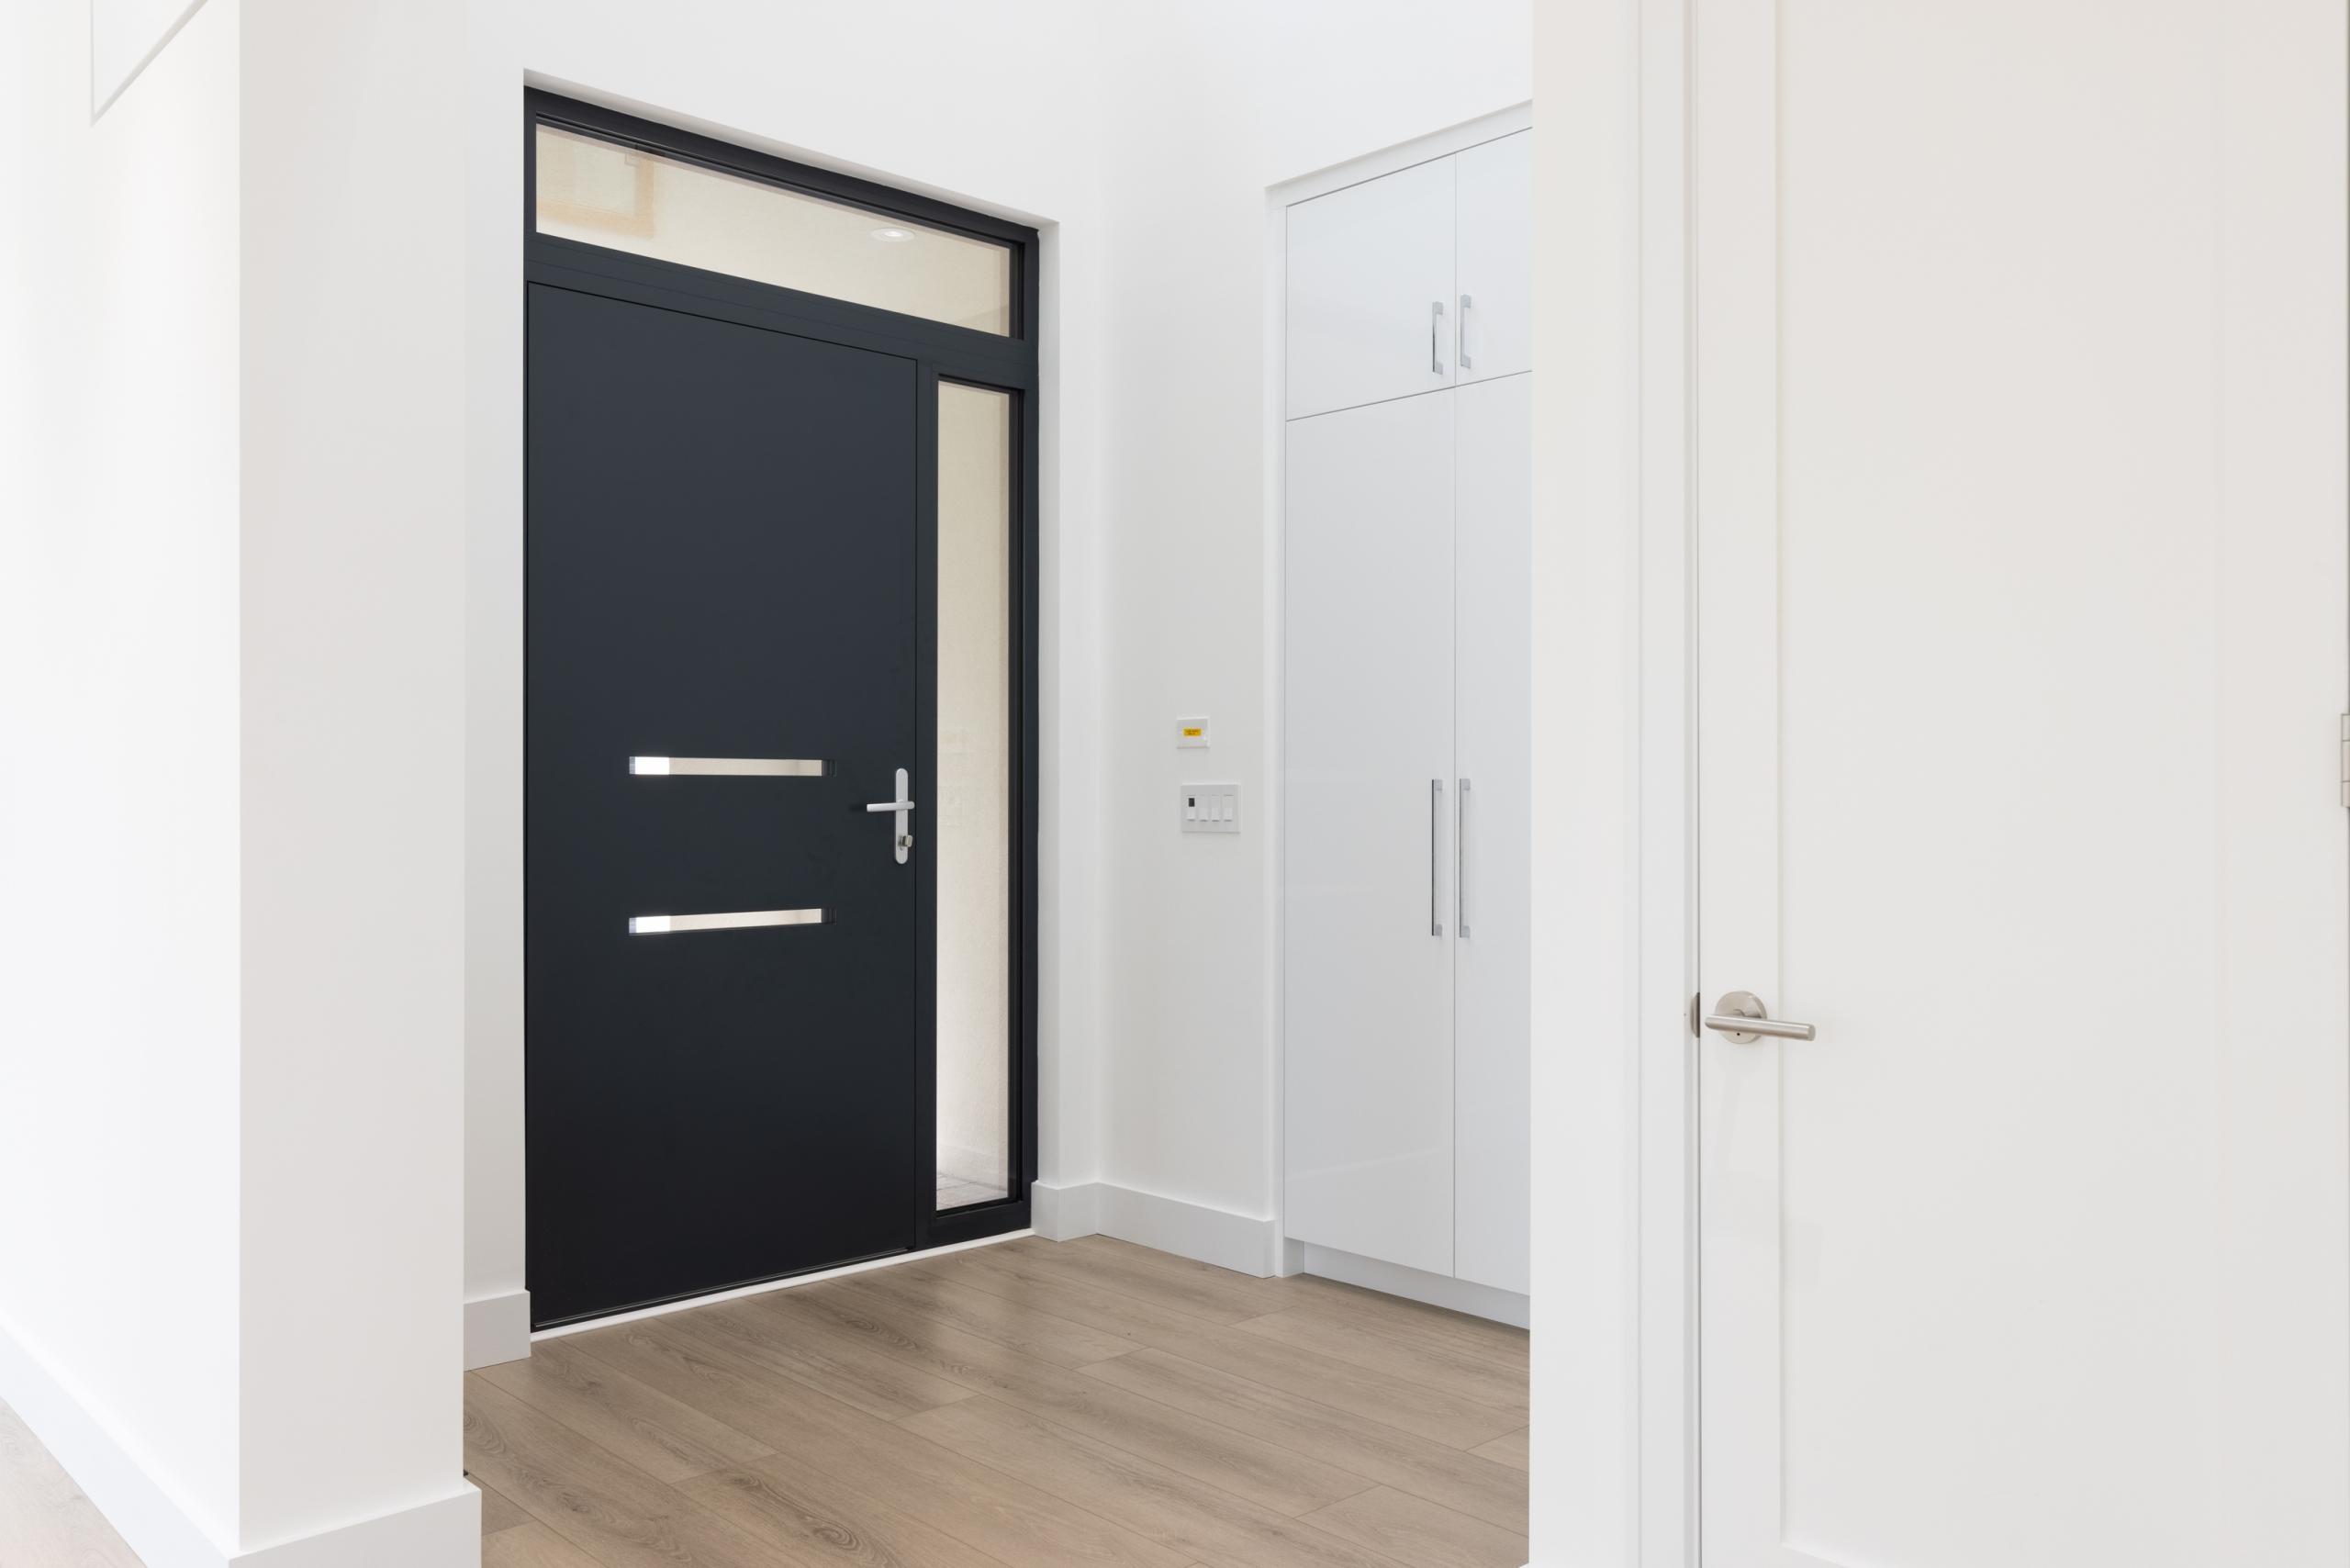 Entrance featured at 287 Sabel Street, Oakville, ON at Alex Irish & Associates